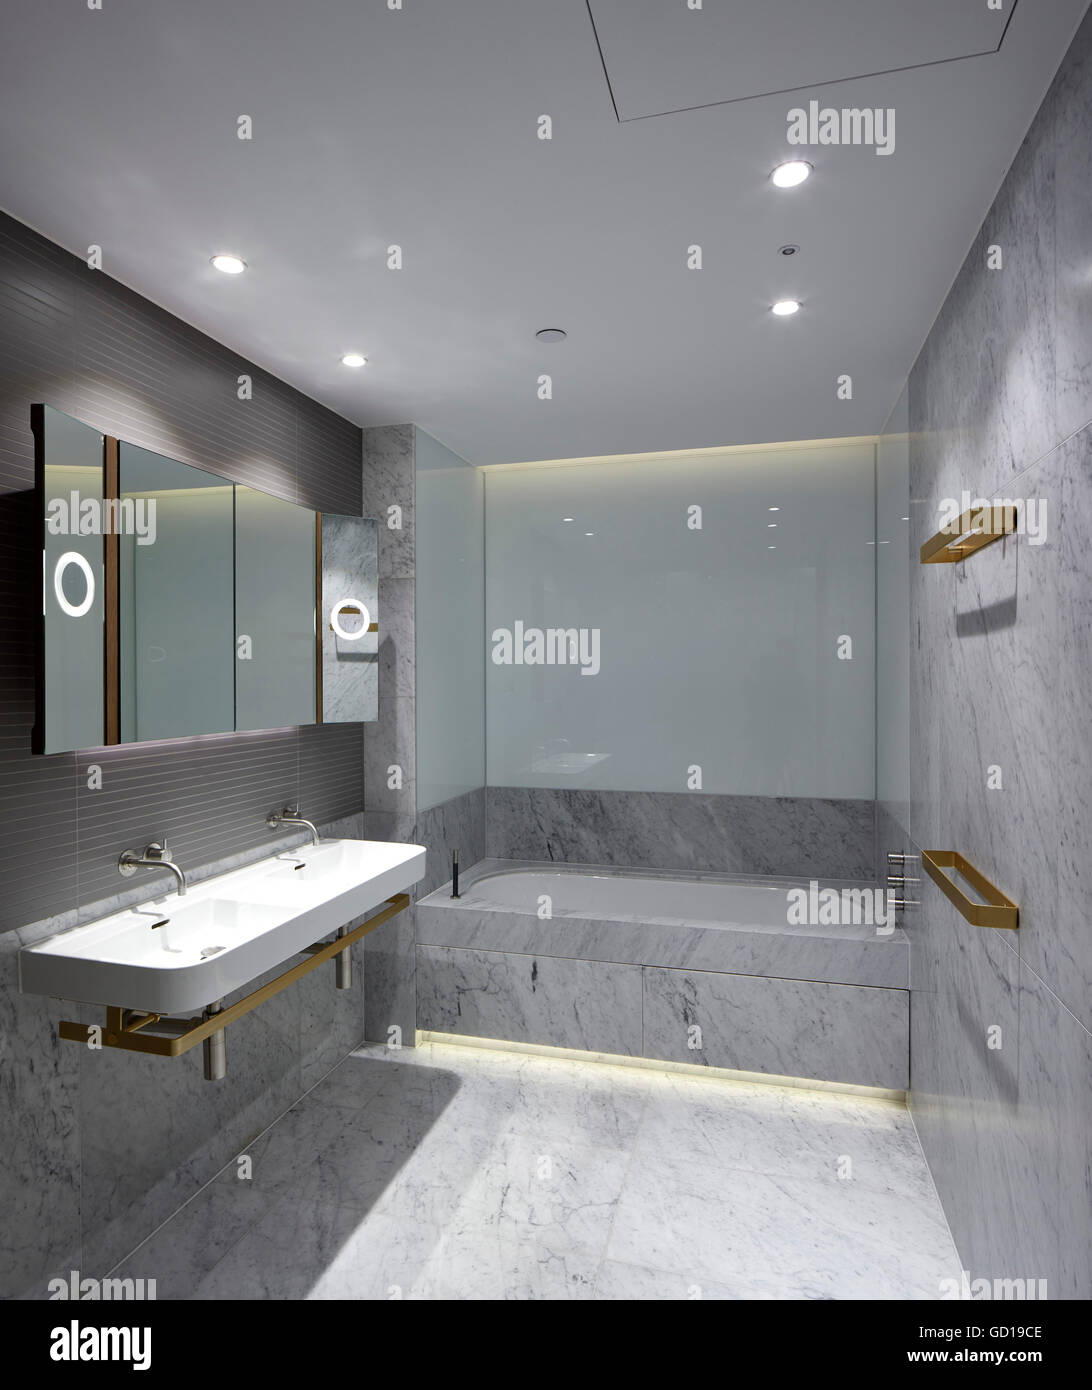 Bathroom Interior Fitzroy Place London United Kingdom Architect Johnson Naylor 2016